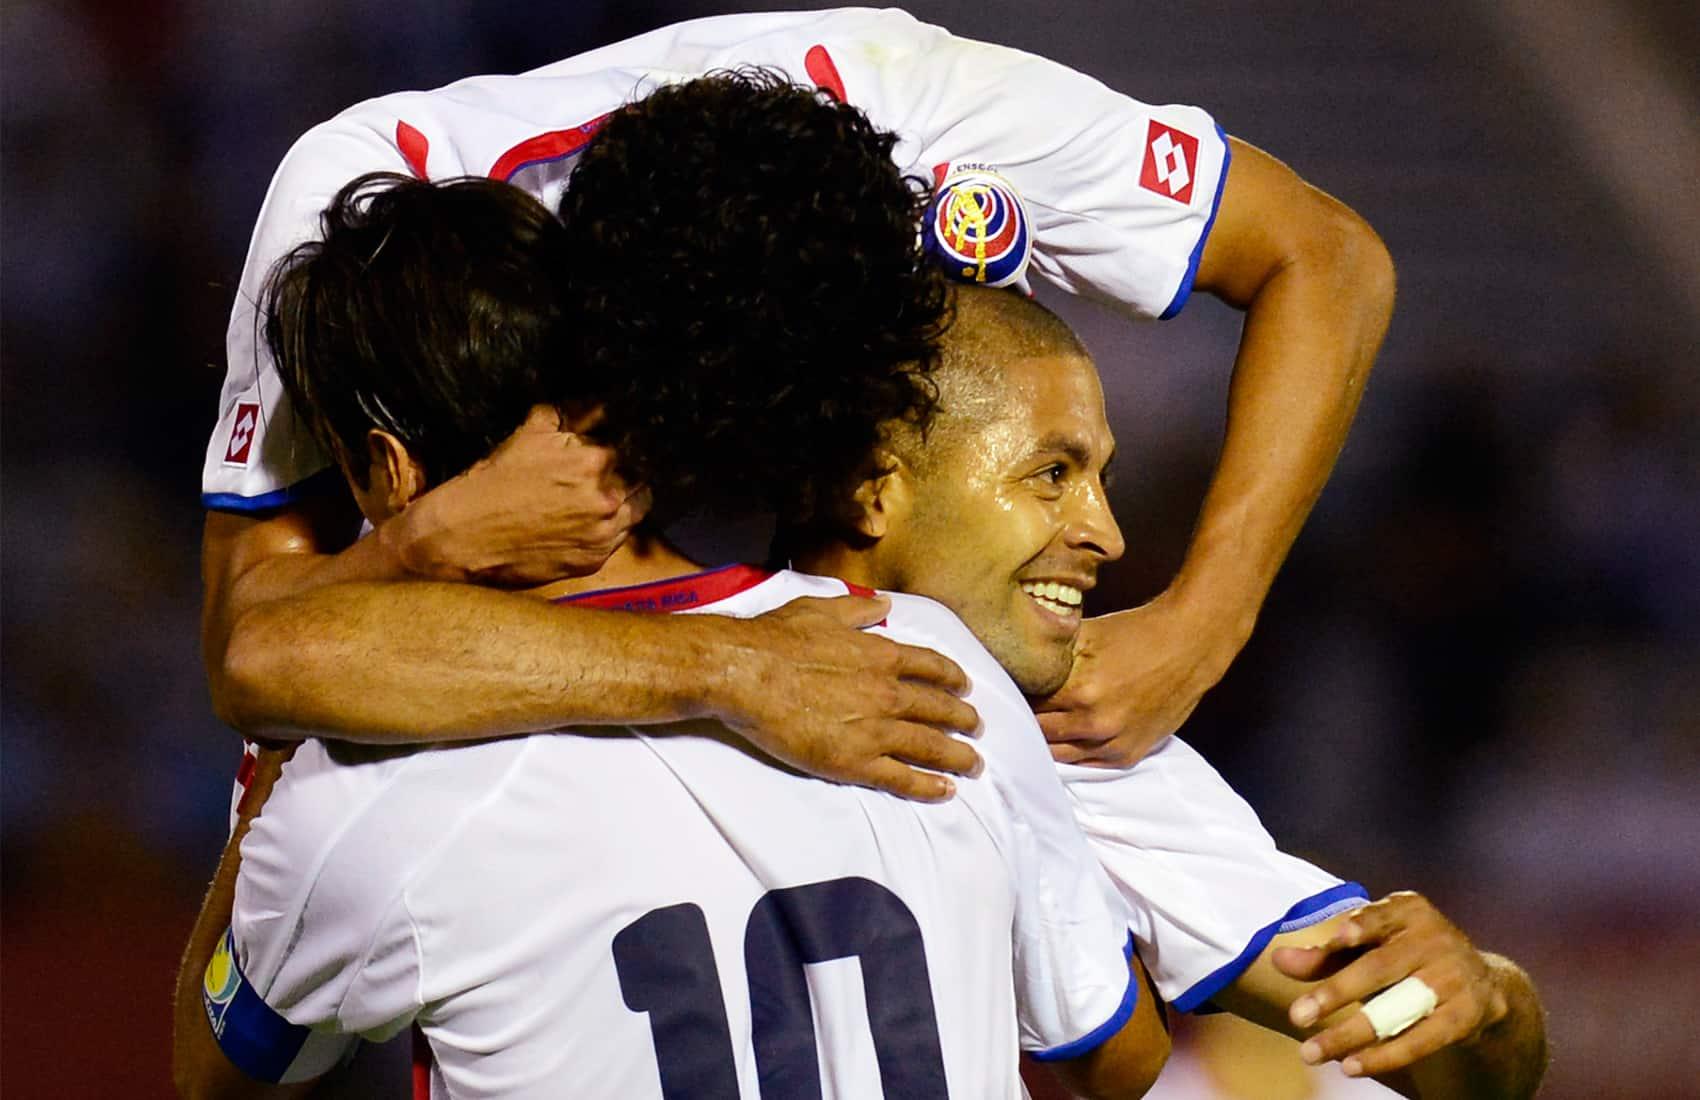 Costa Rica's victory over Uruguay